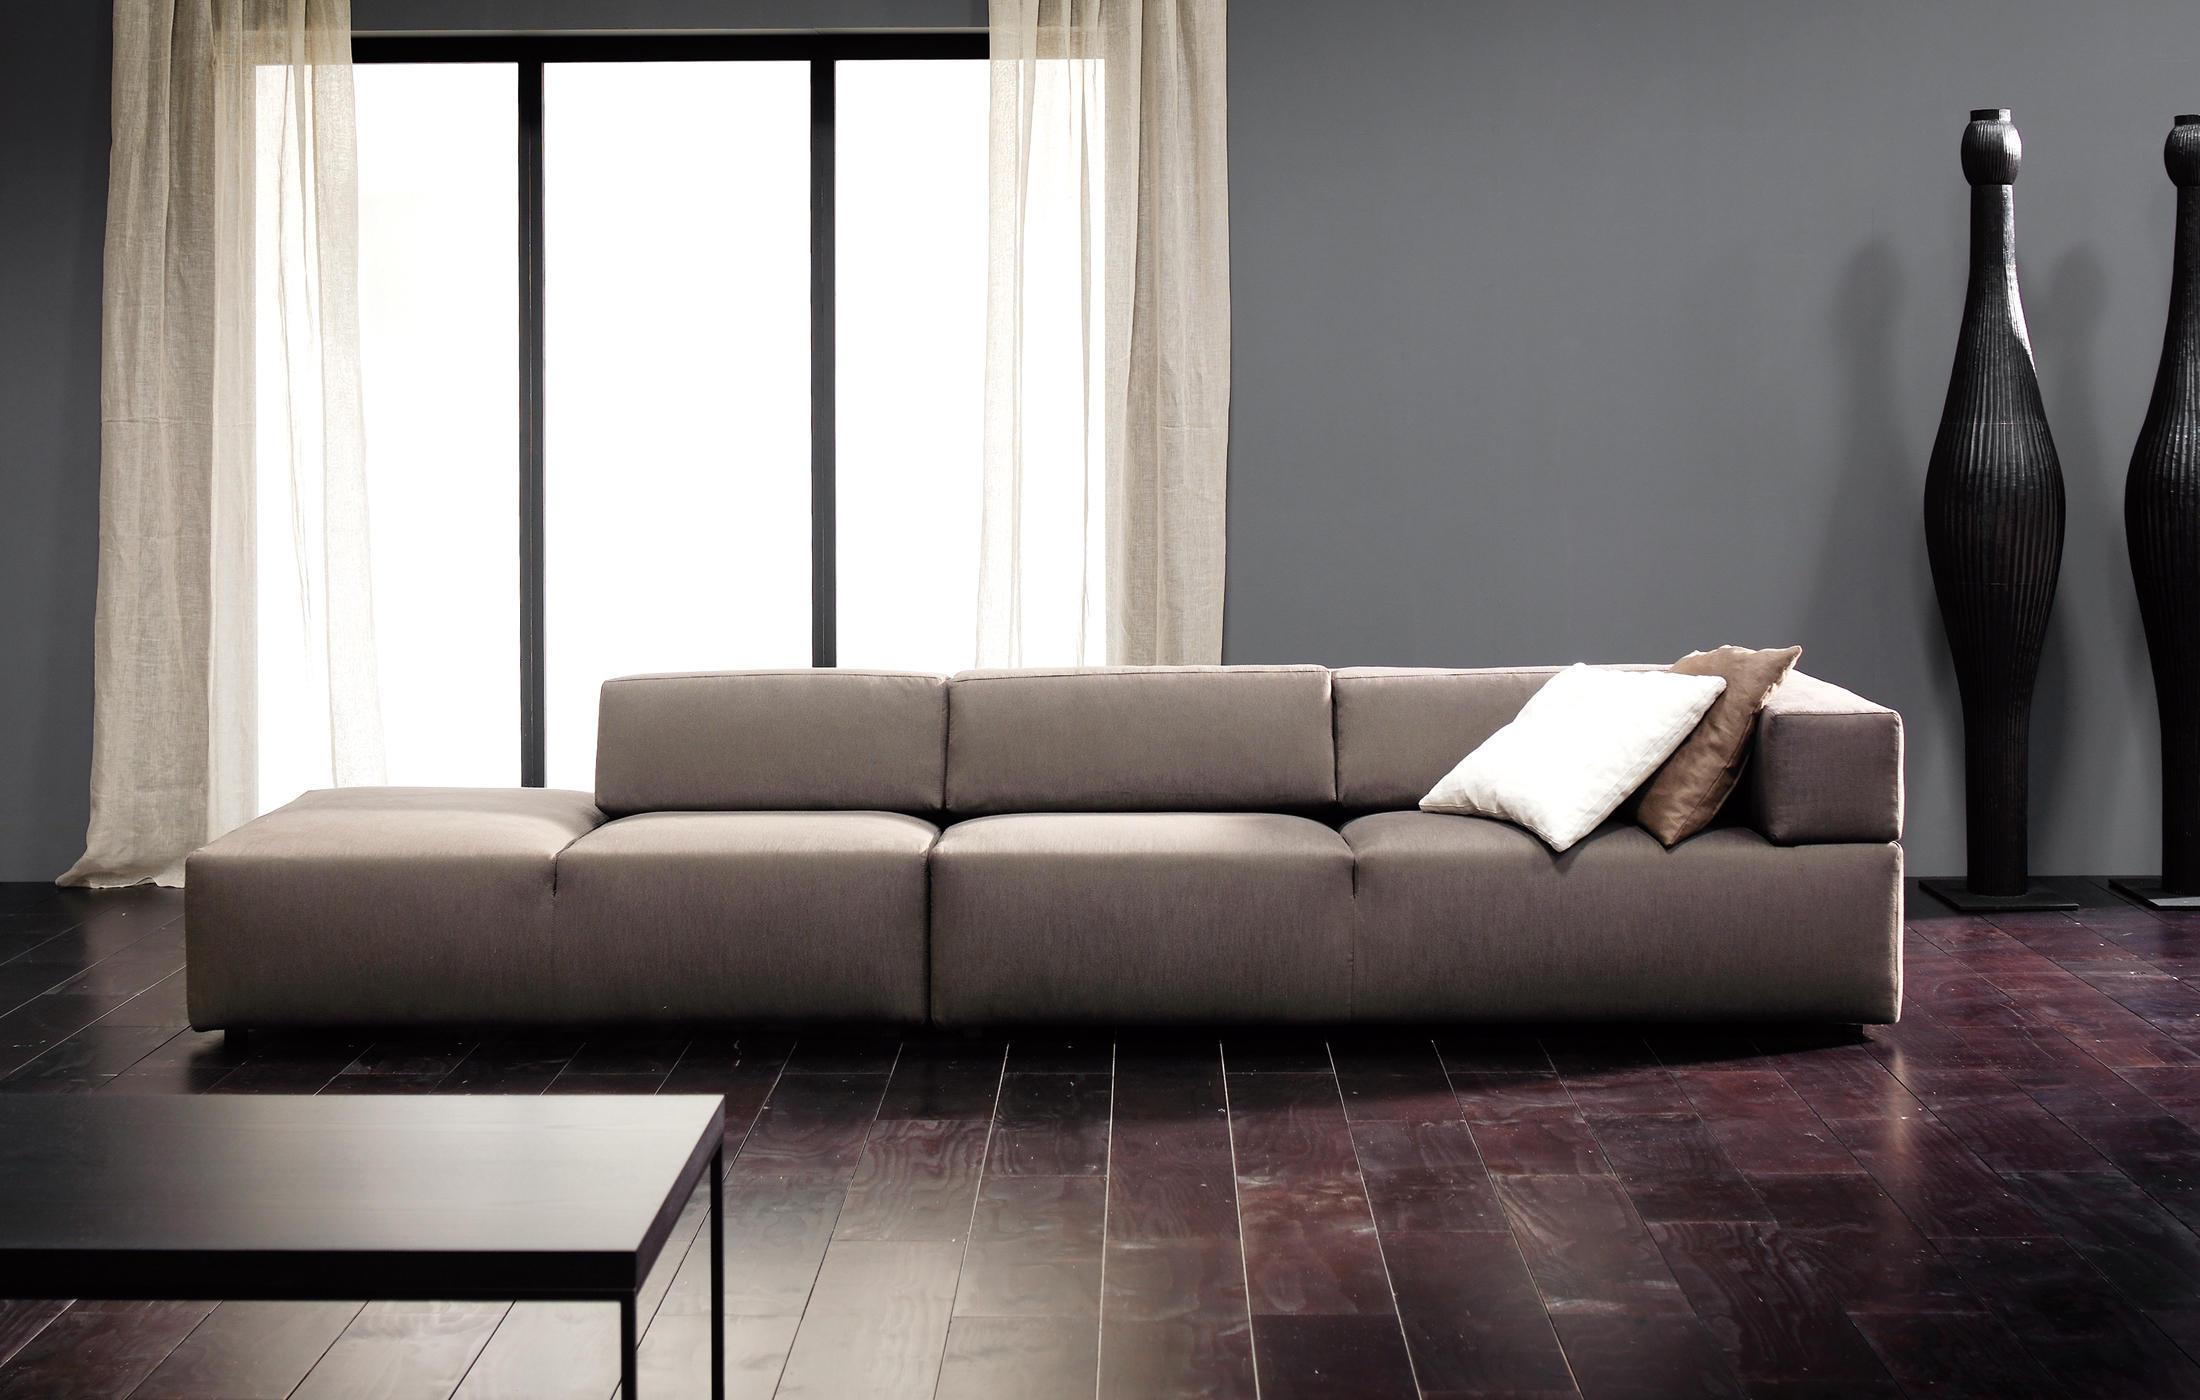 Toc sof s lounge de rafemar architonic - Rafemar sofas ...